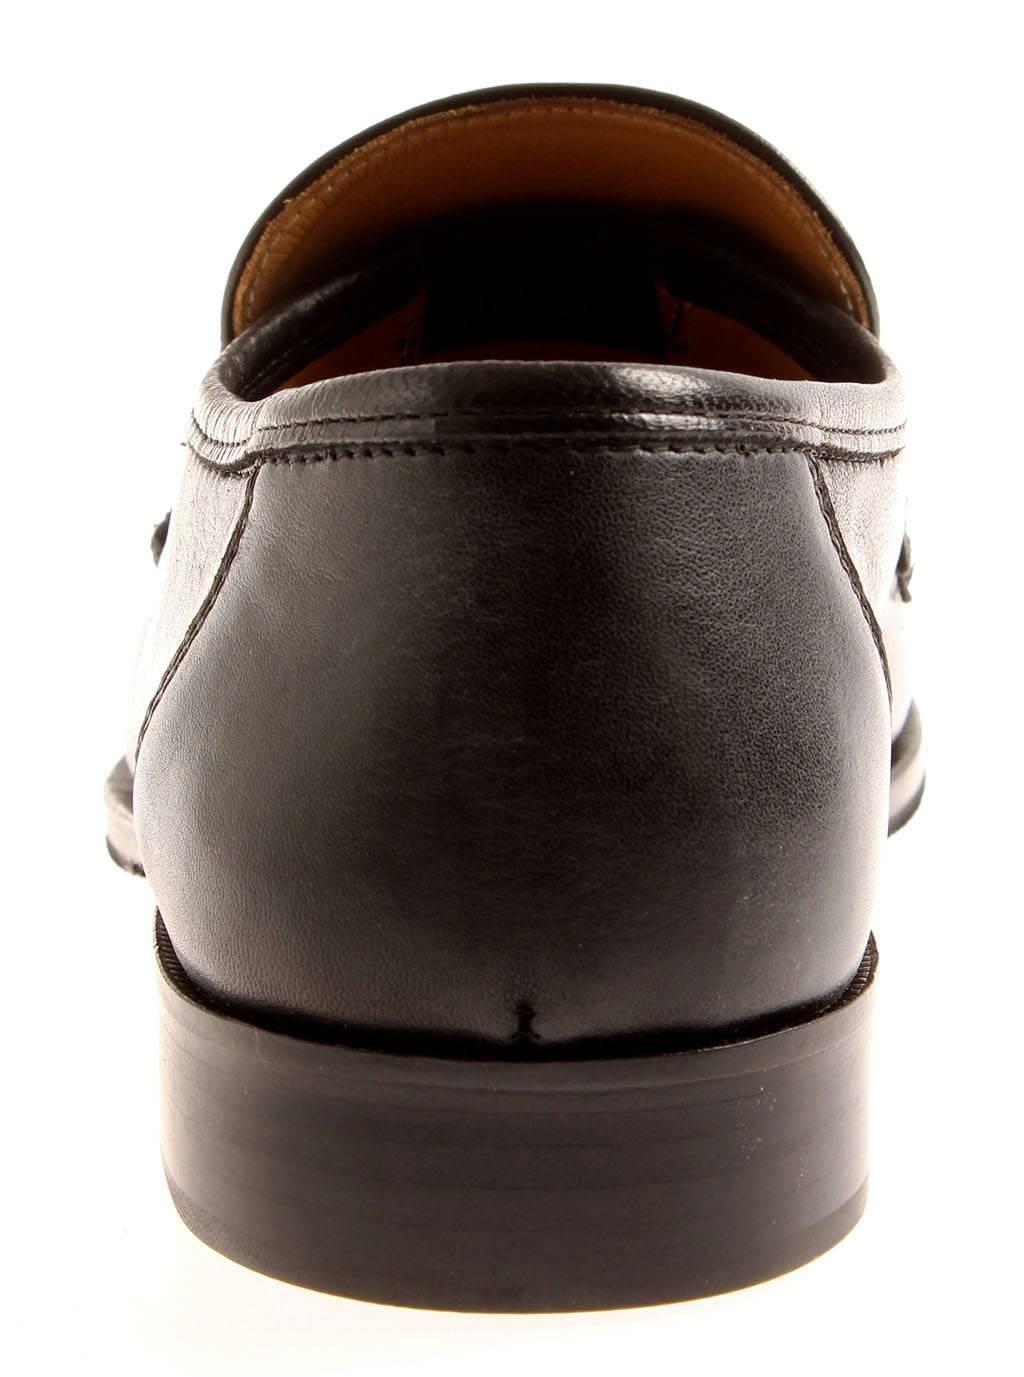 FRETZ Uomo Classica TORINO UOMO Glowe Classica Uomo Scarpe Basse Slipper COGNAC 7011.0472 478716